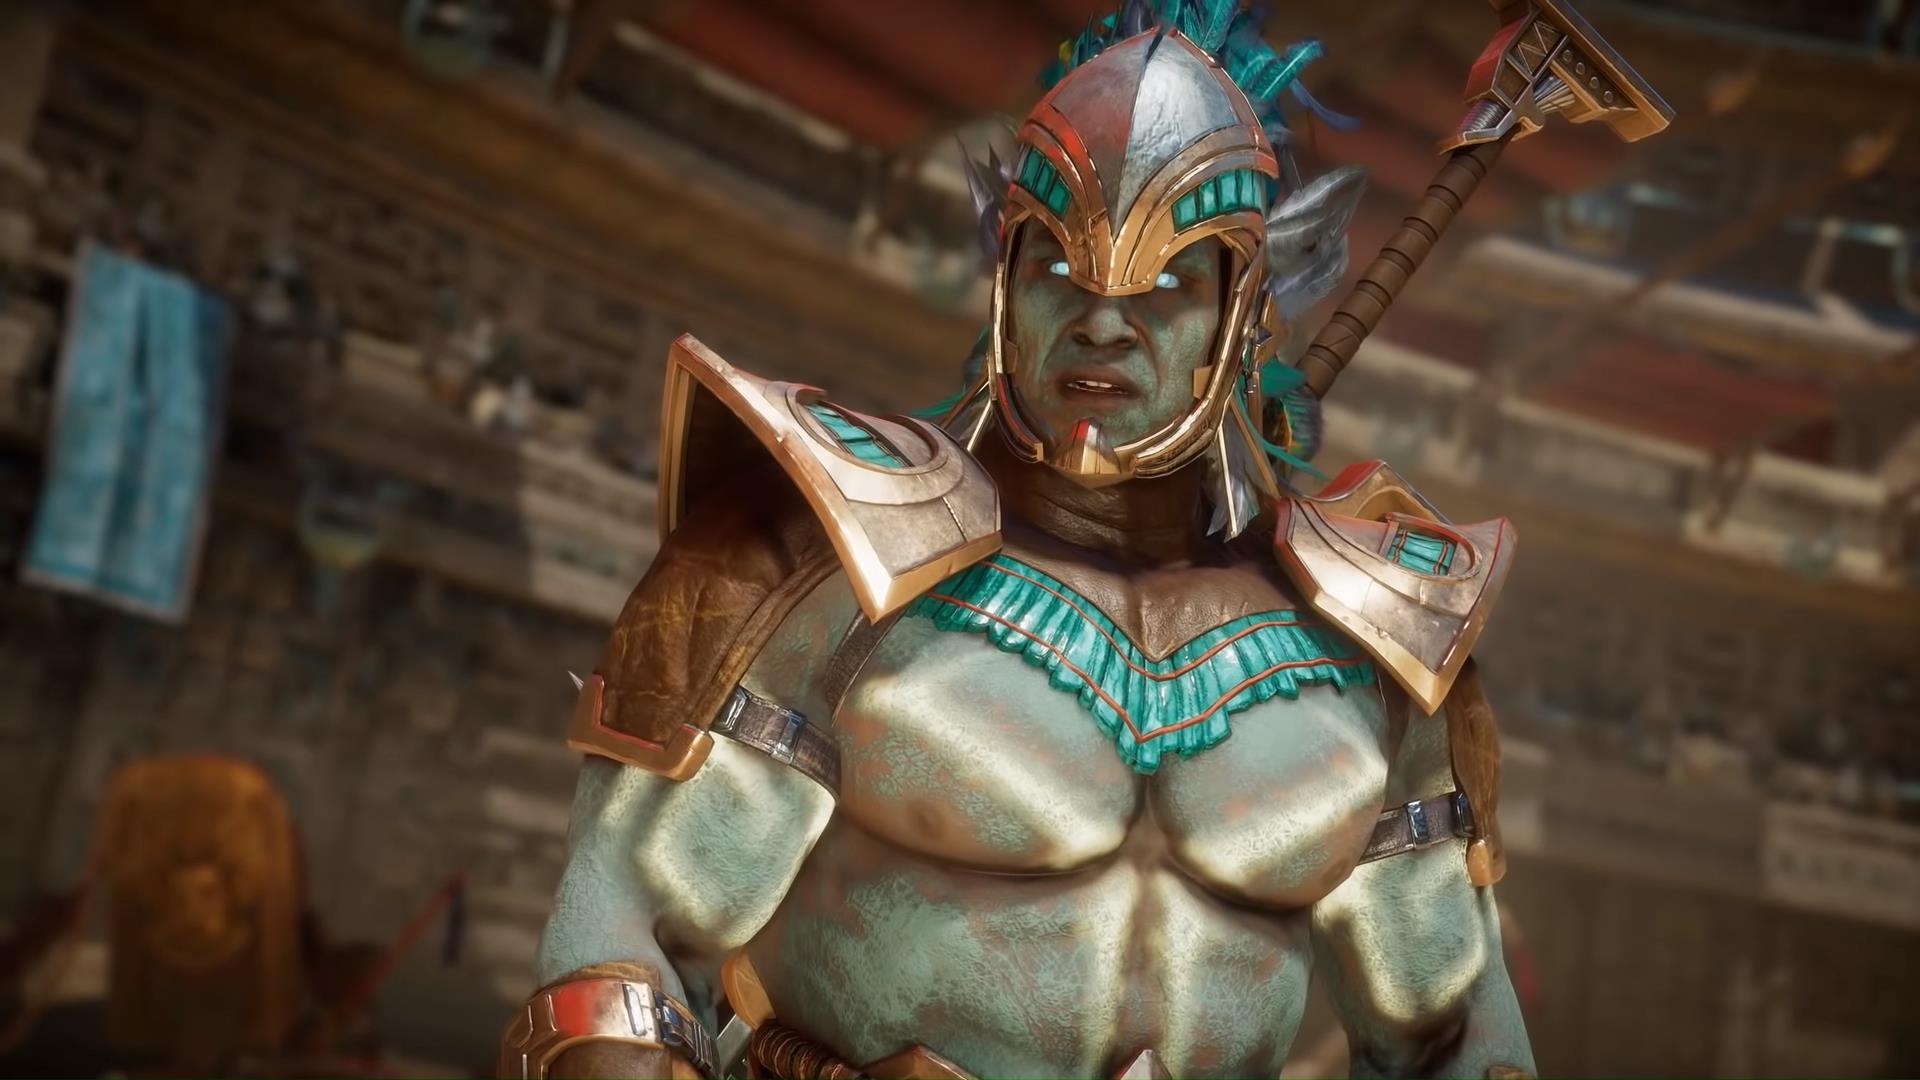 Image for Mortal Kombat 11 trailer introduces the return of Kotal Kahn, Jacqui Briggs